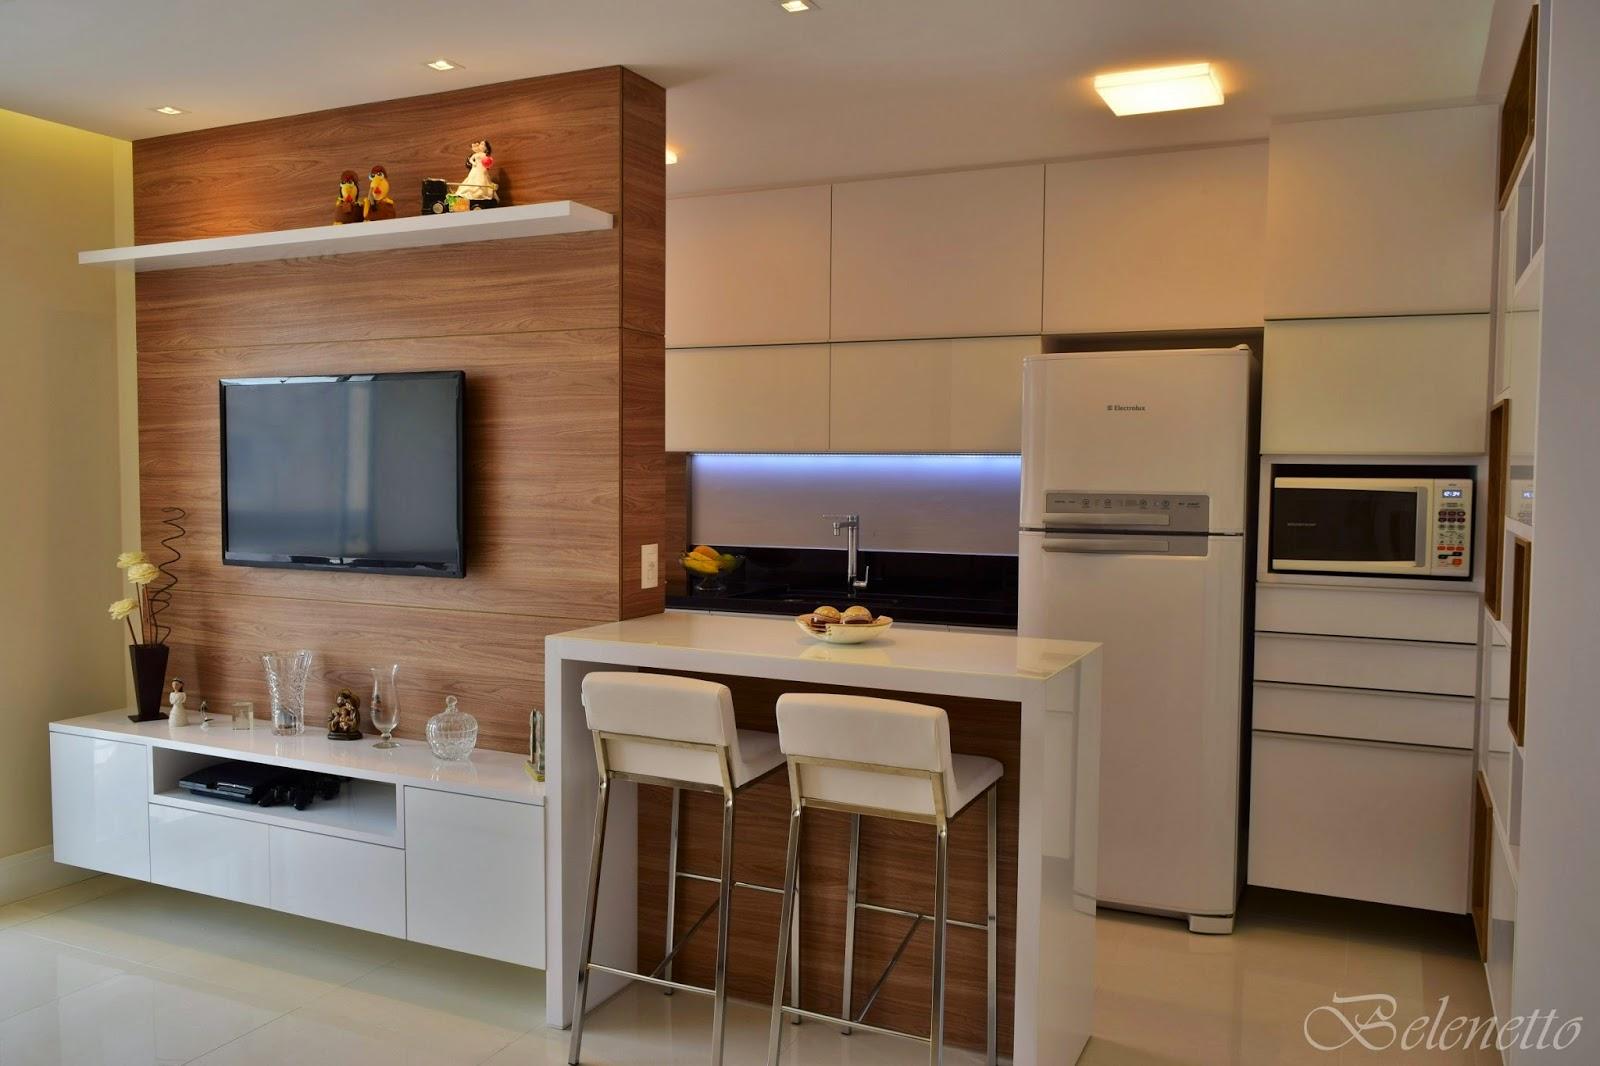 Belenetto Marcenaria Personalizada: Cozinha e Sala integrada  #956C36 1600 1066